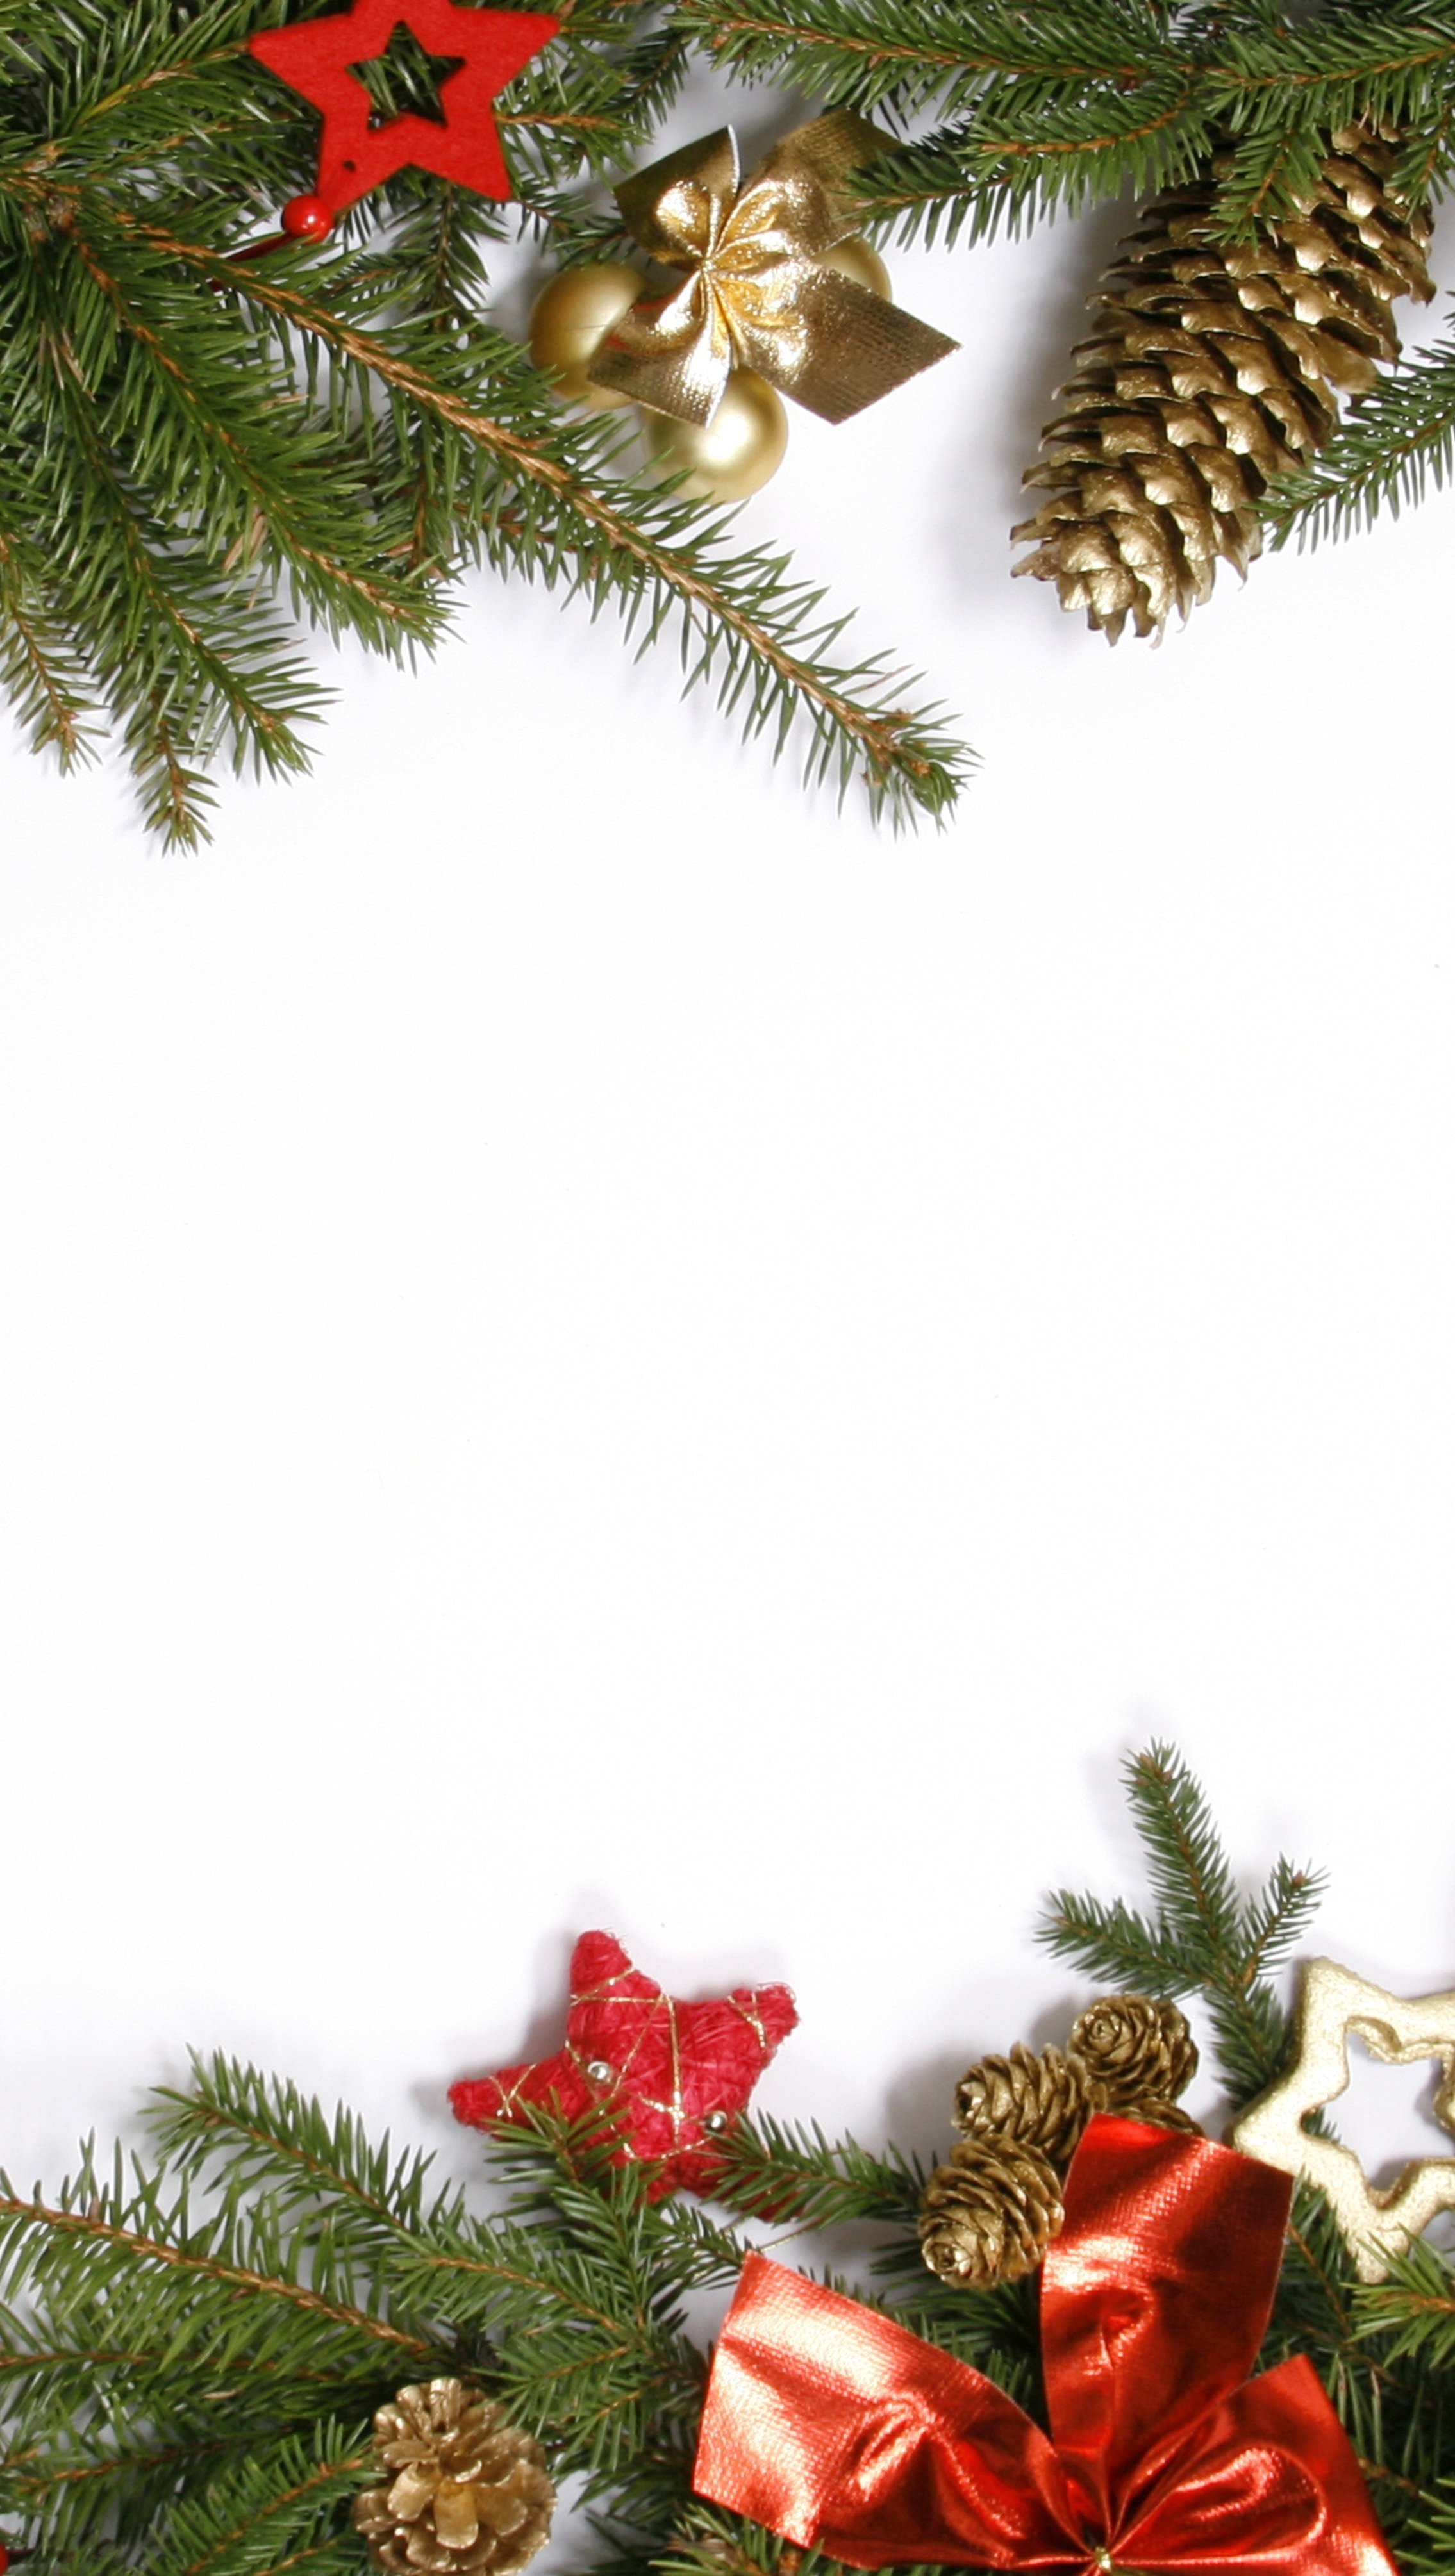 Wallpaper Decoration Christmas Ornaments Vertical